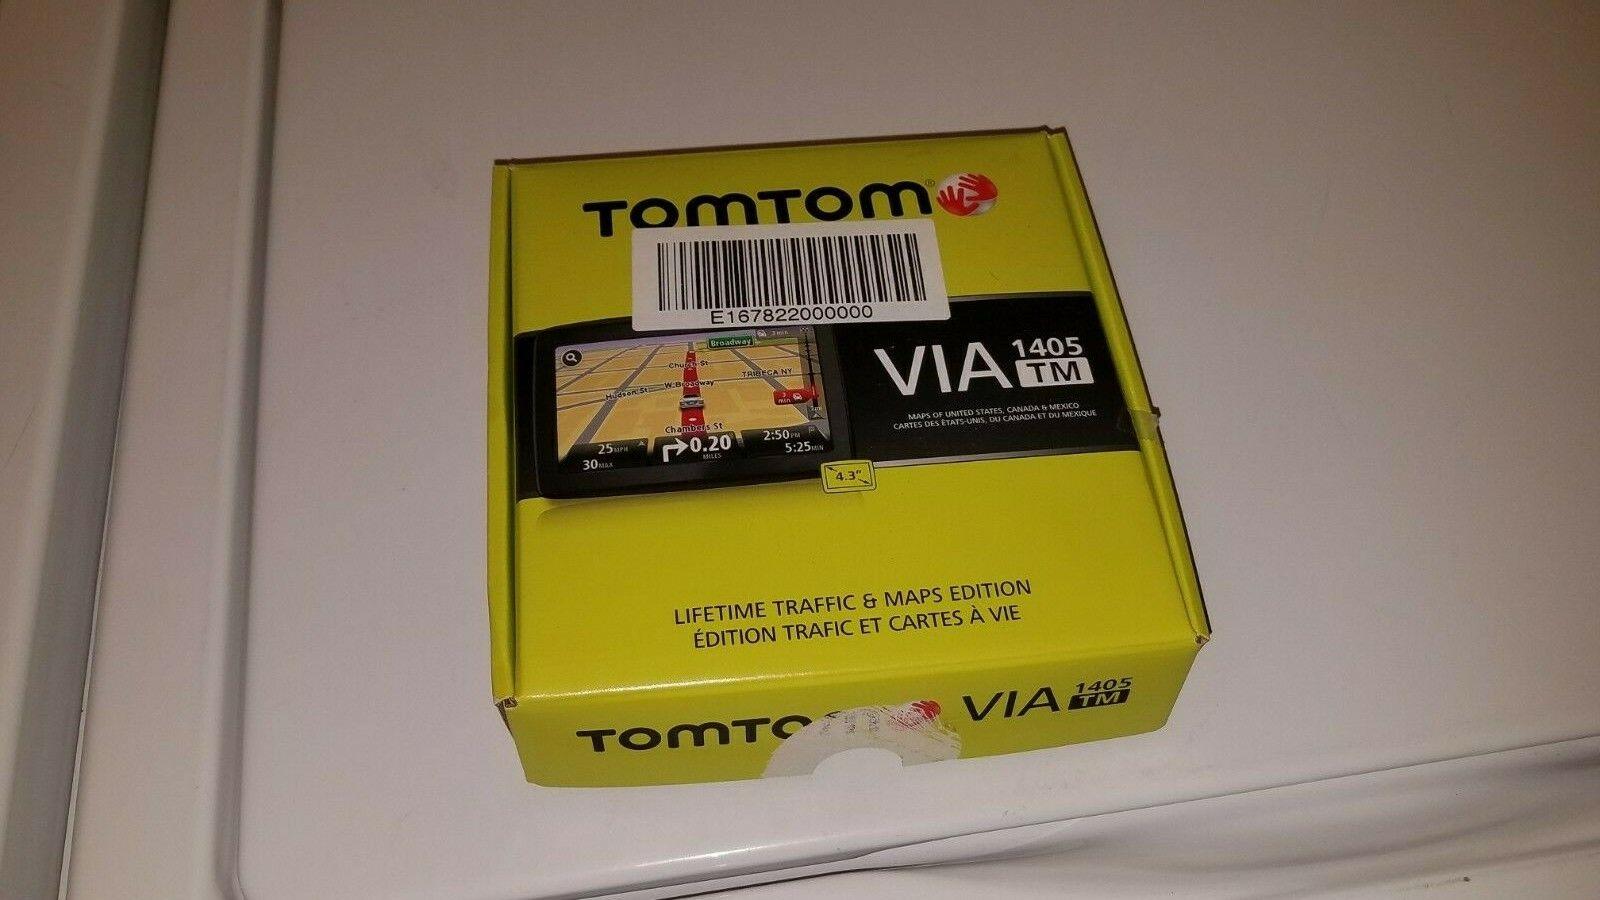 TomTom VIA 1405TM 4.3 Inch Portable GPS Navigator With Lifetime Traffic Maps - $20.00